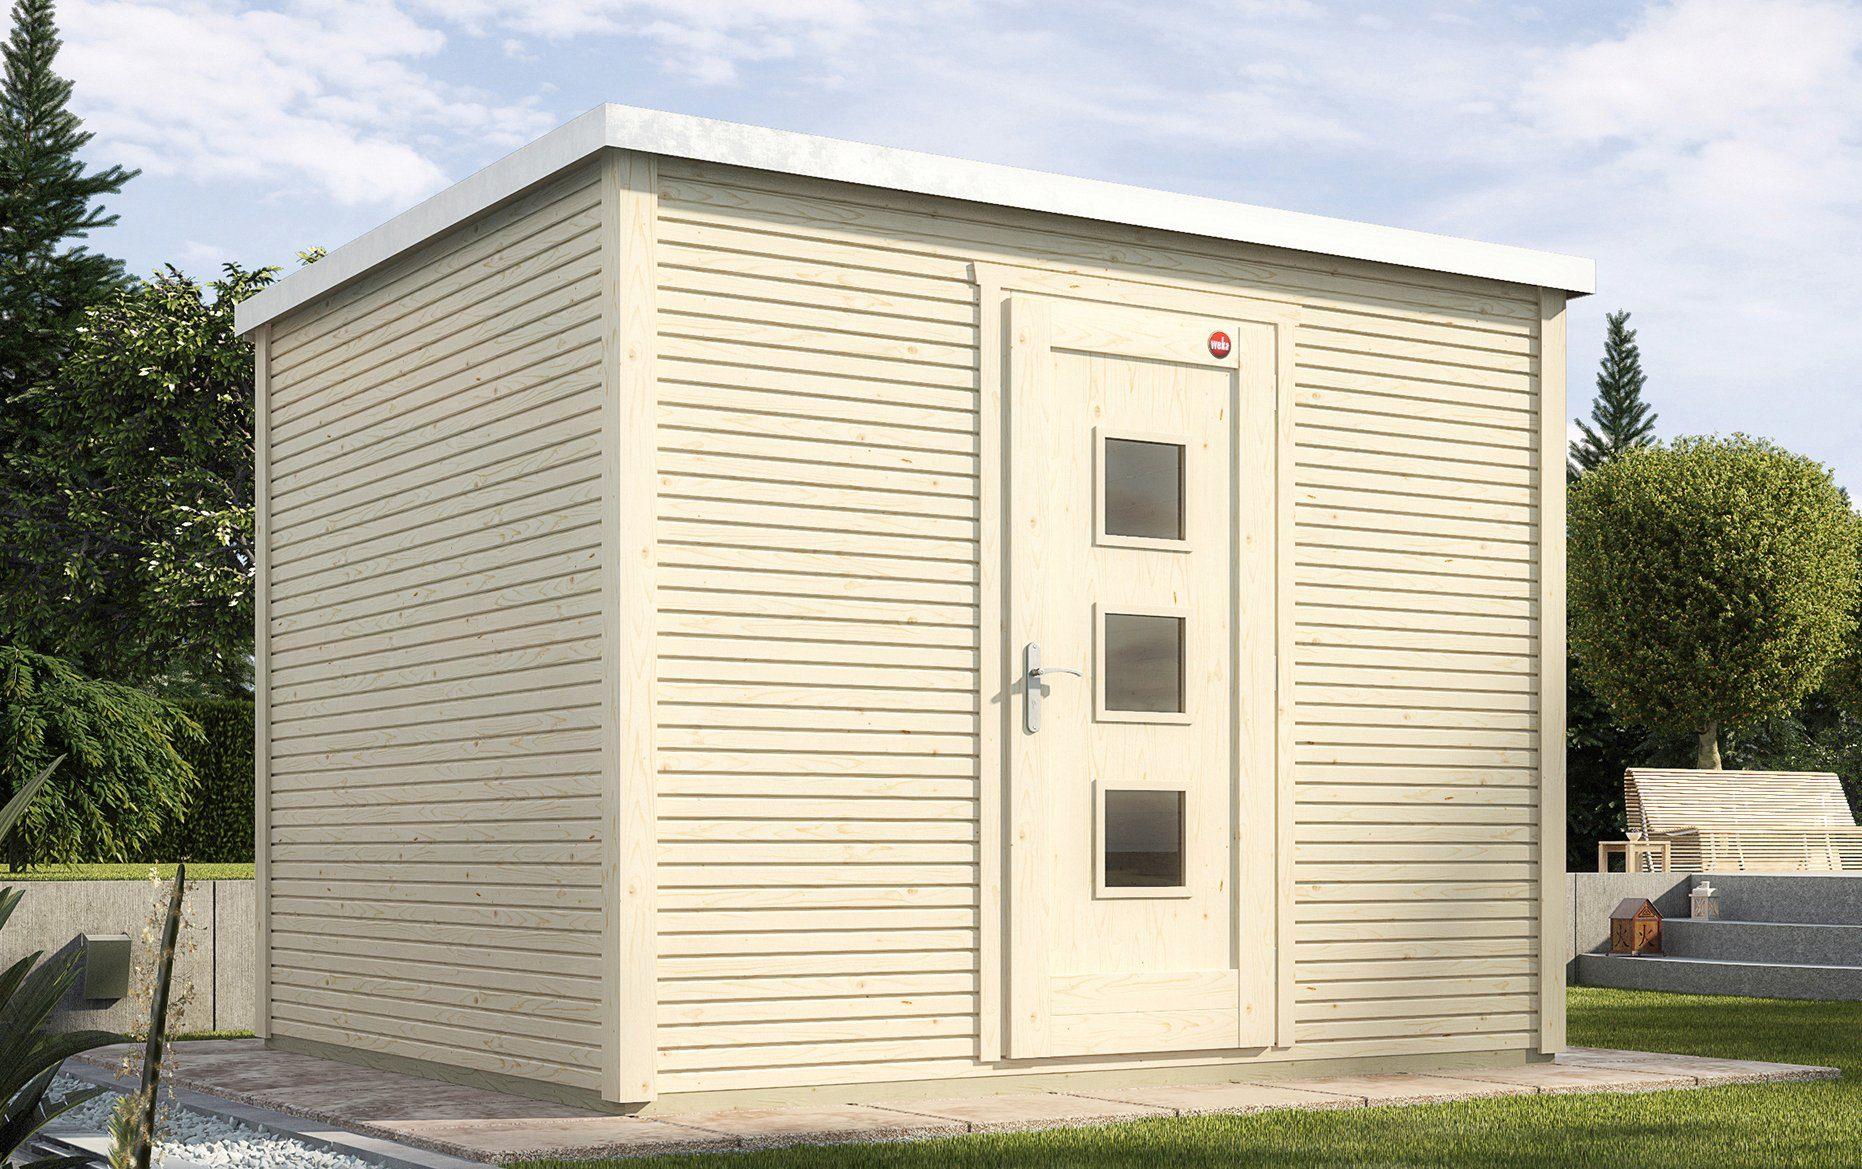 WEKA Gartenhaus »wekaLine 413 Gr.2«, BxT: 310x310 cm, inkl. Fußboden und Dachbahn